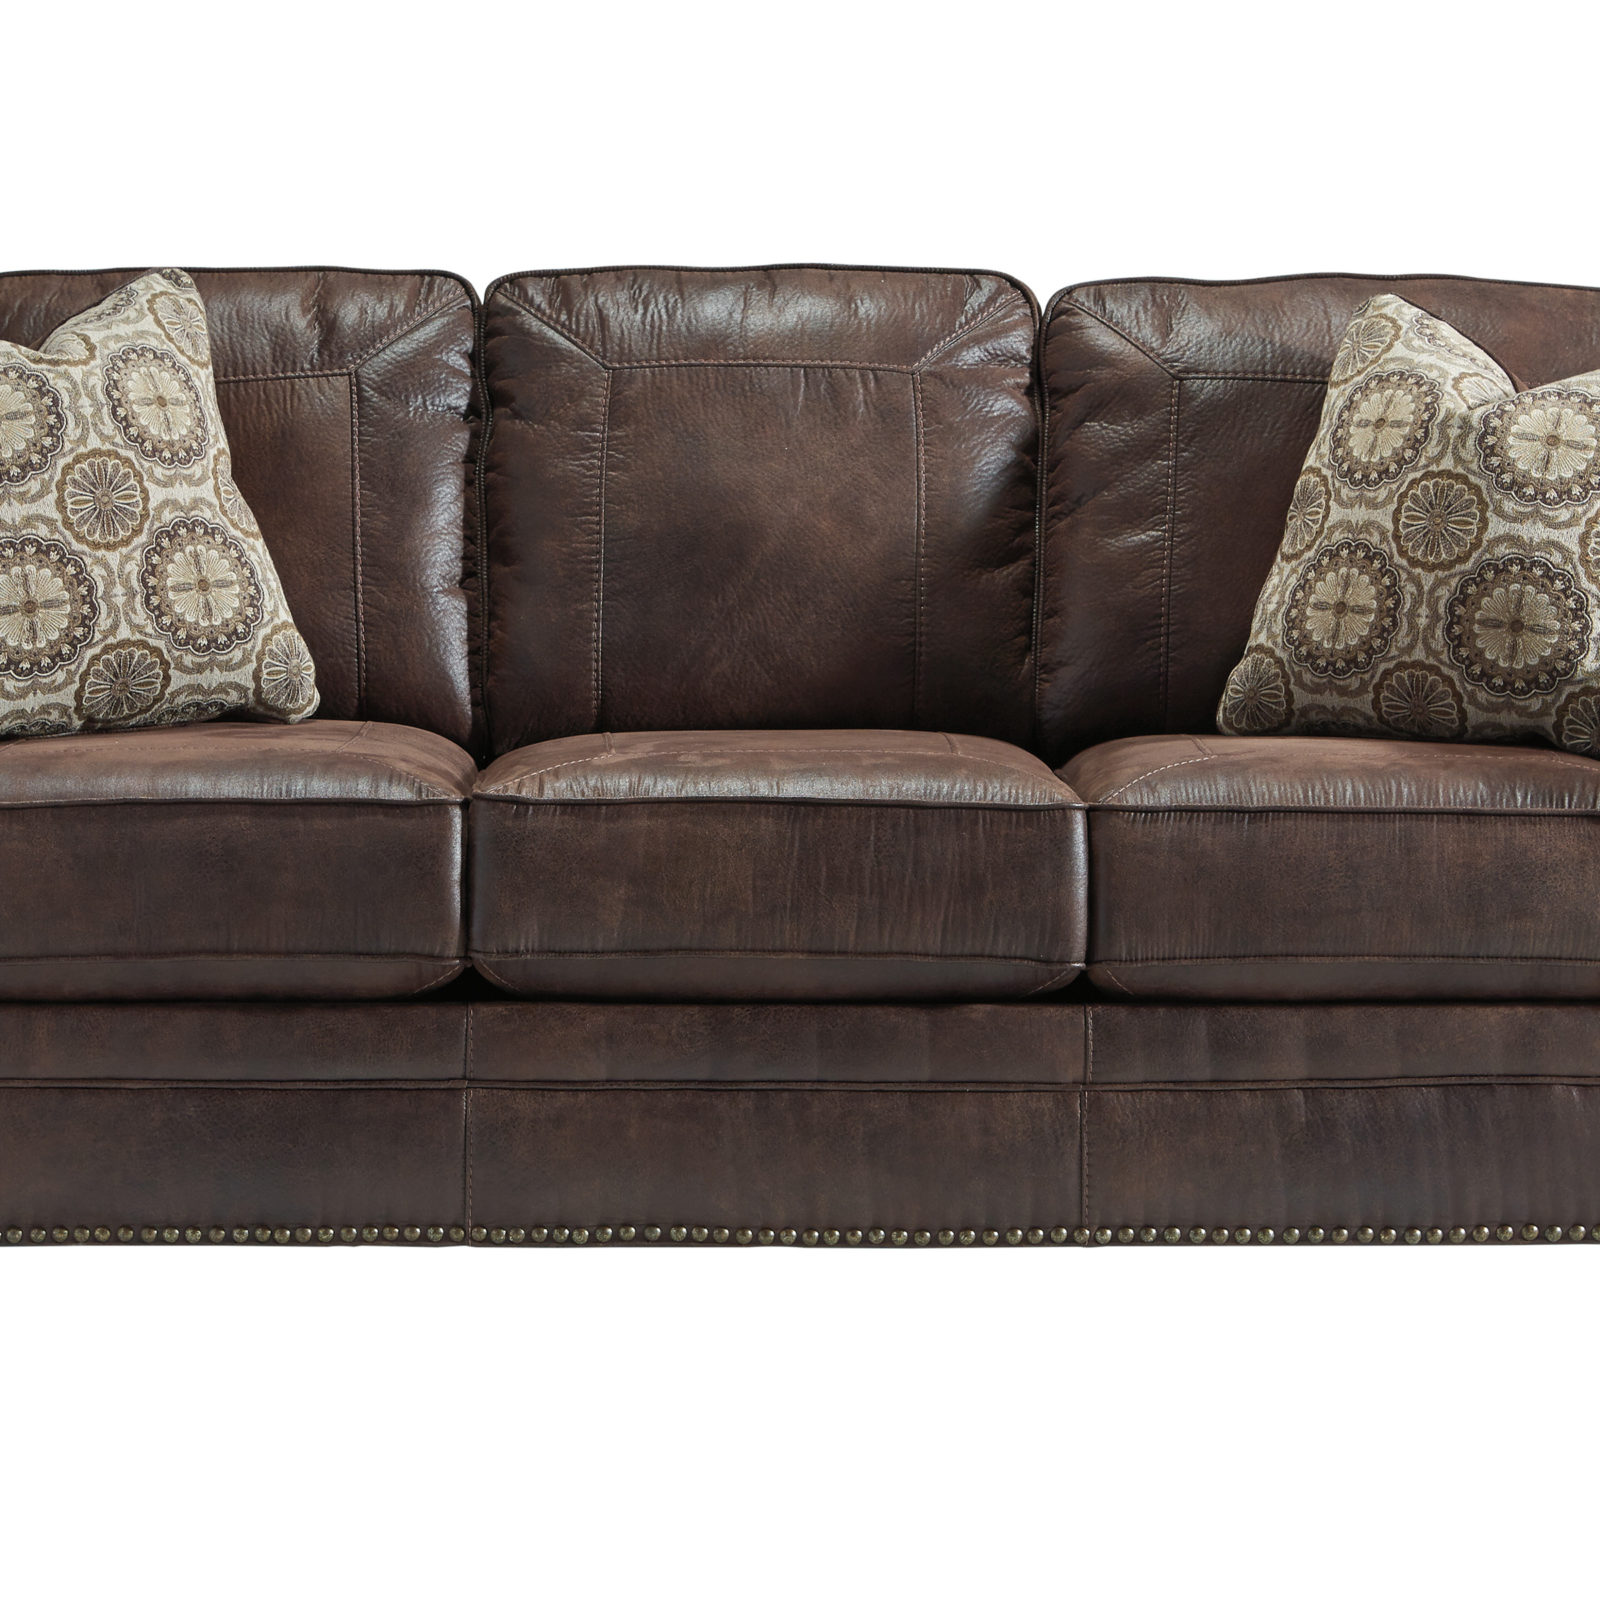 queen sofa bed no arms chesterfield fabric australia benchcraft breville harrington home furniture